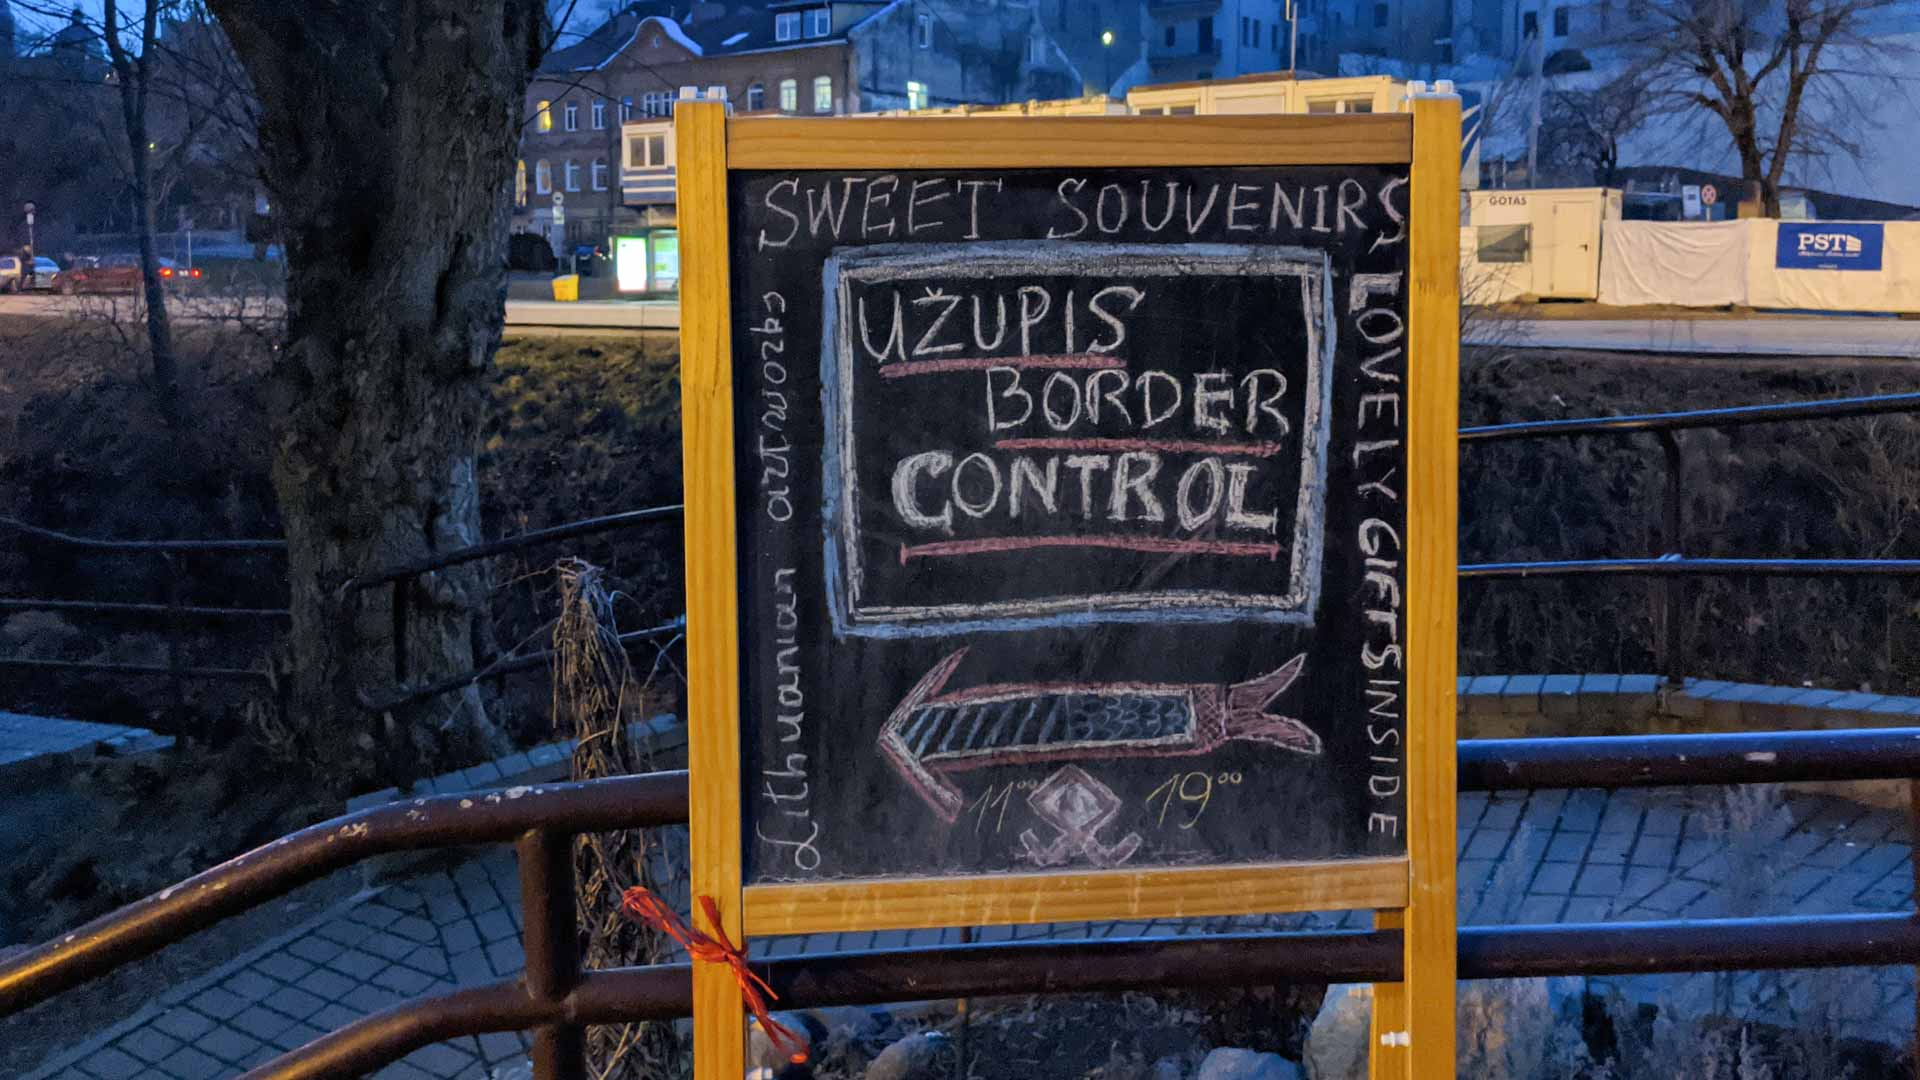 Uzupis border control sign, Vilnius, Lithuania